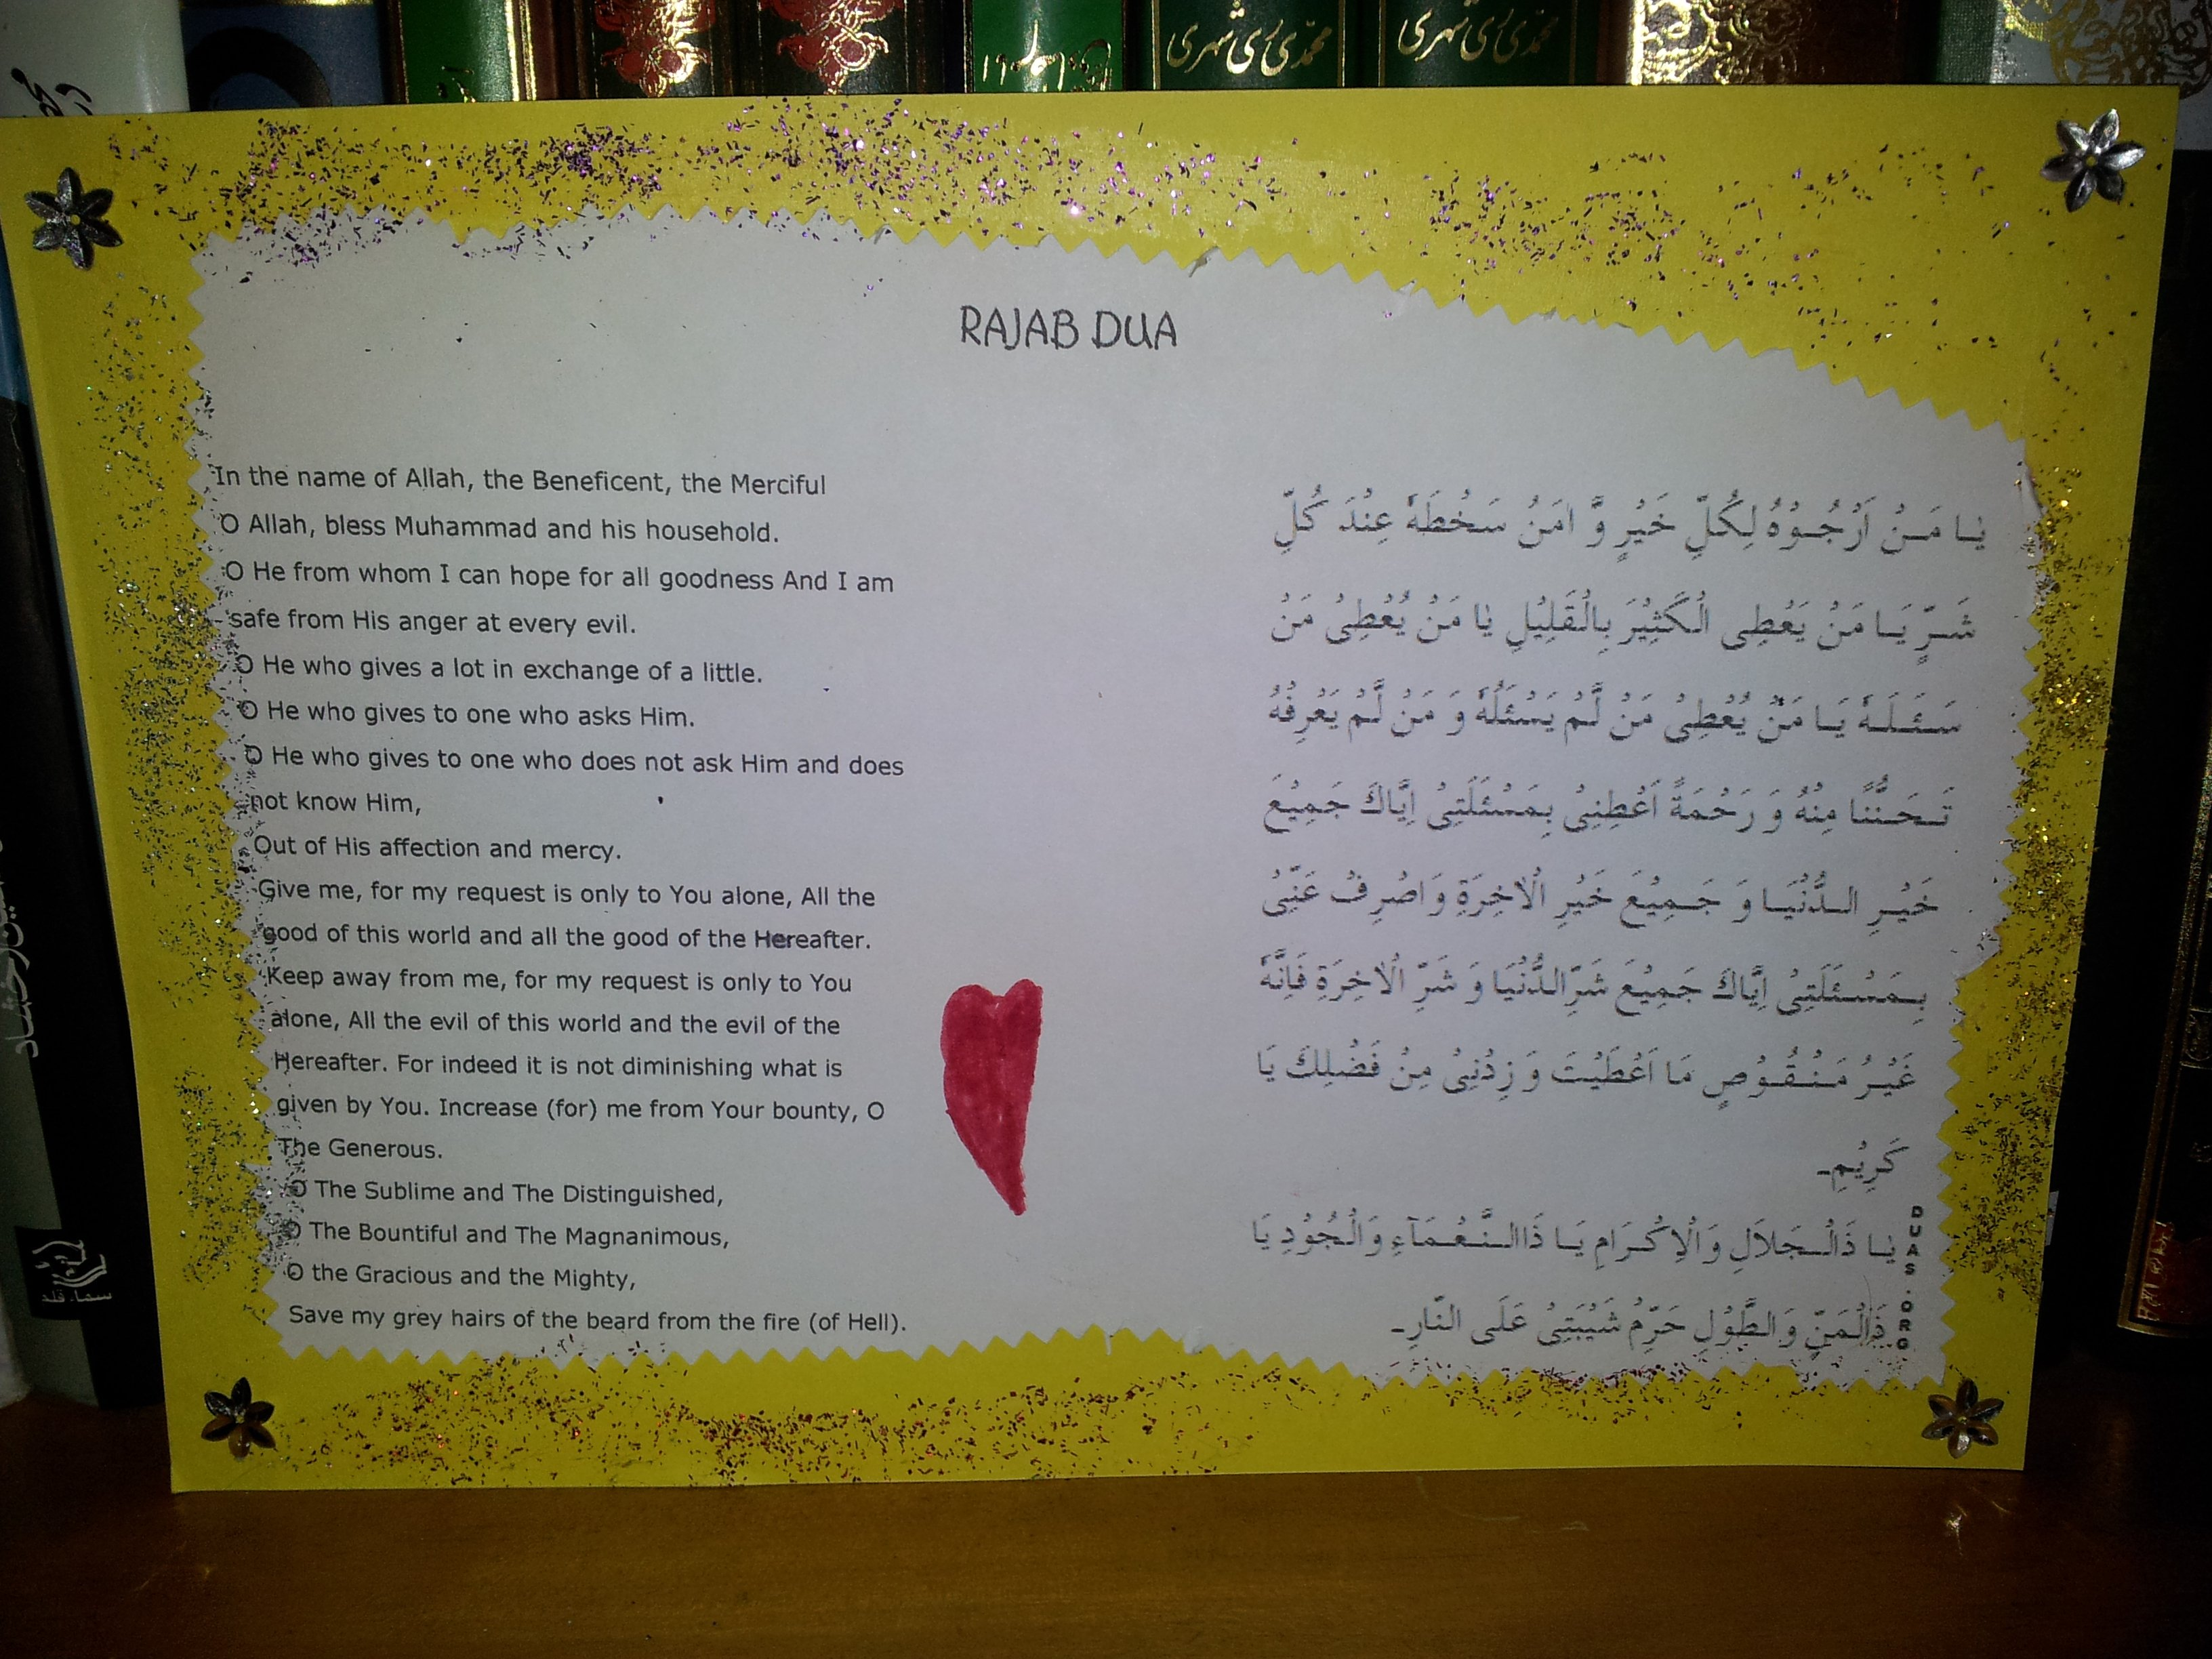 Rajab Idea 3: Decorate the Dua for Rajab and keep it handy!